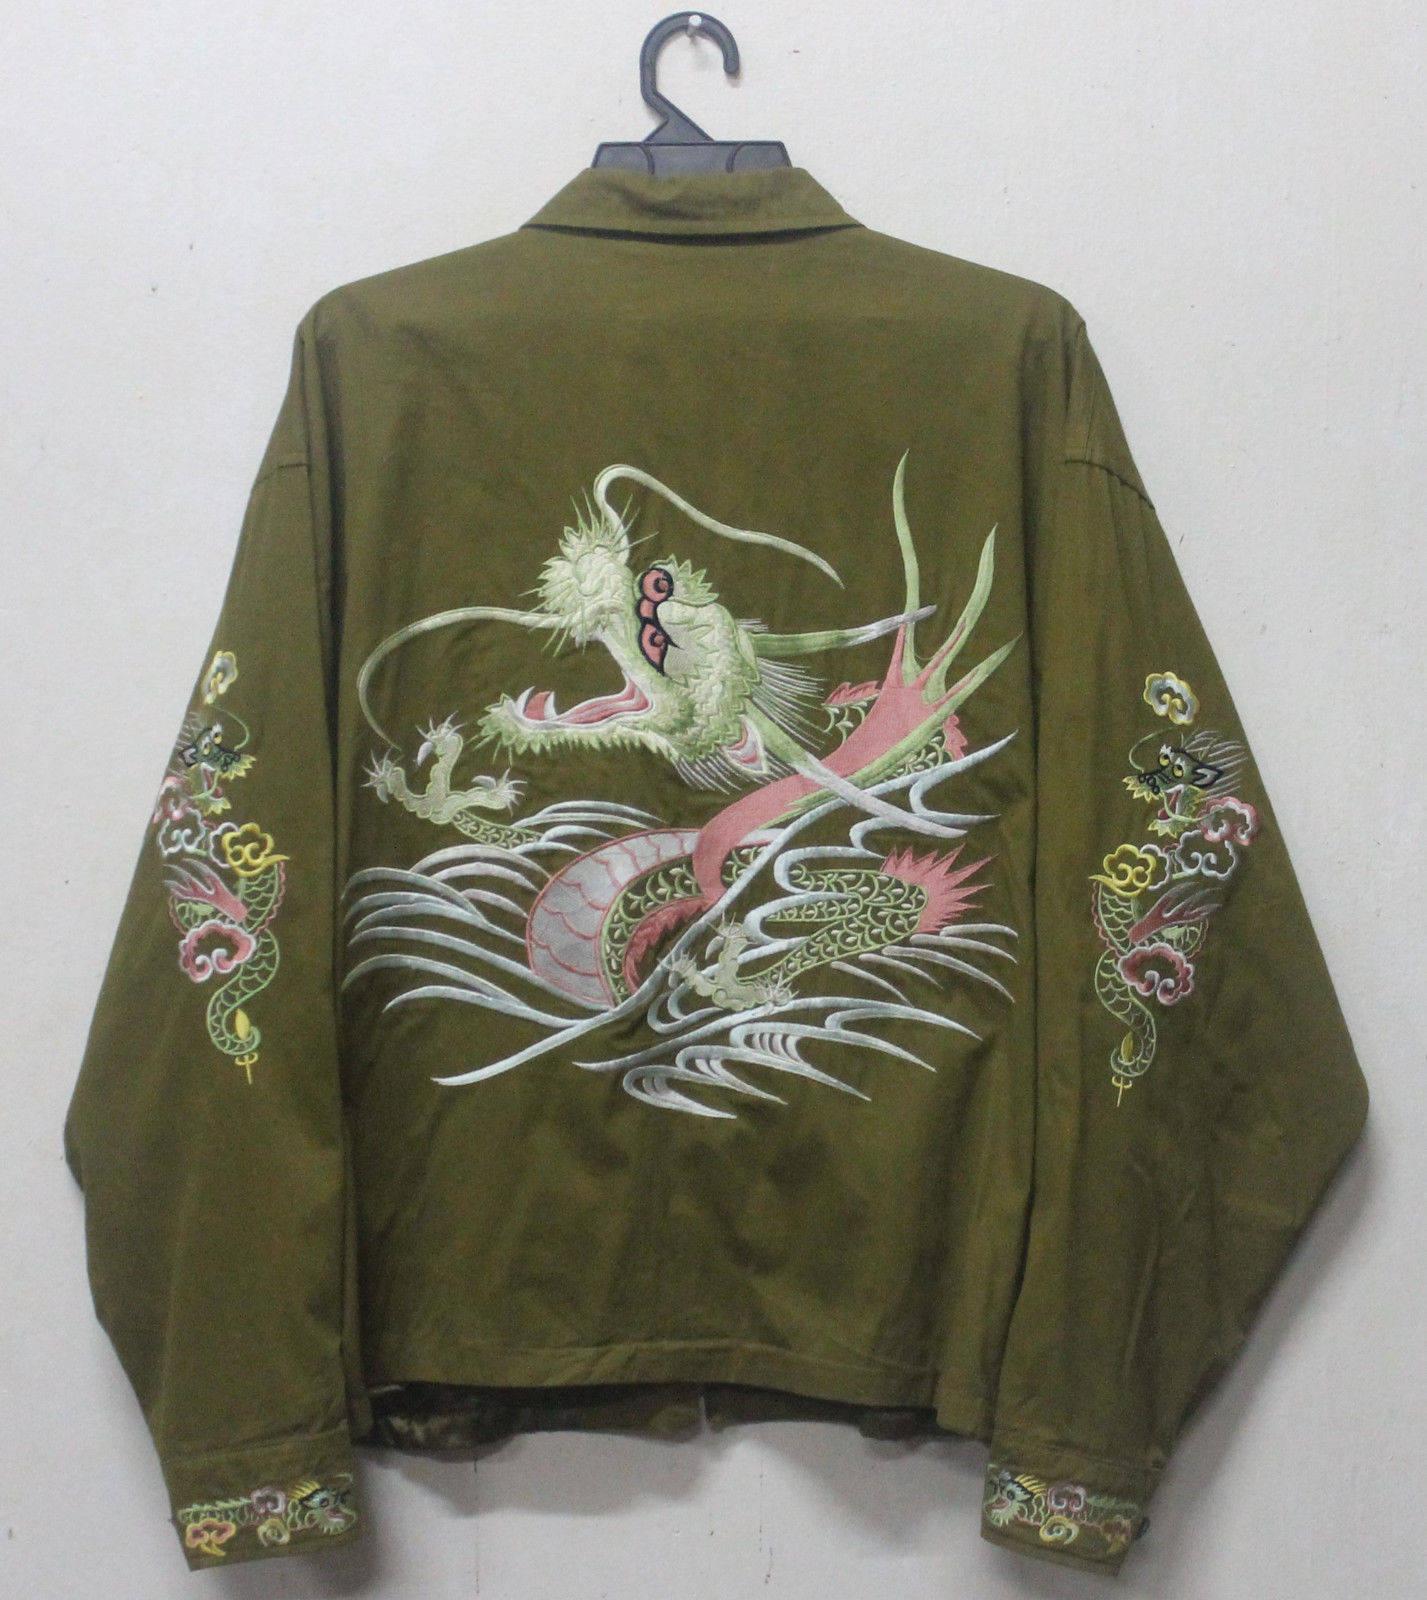 Vintage 60s Sukajan Embroidered Jacket from Vietnam War Era from Old Luxury Garbage